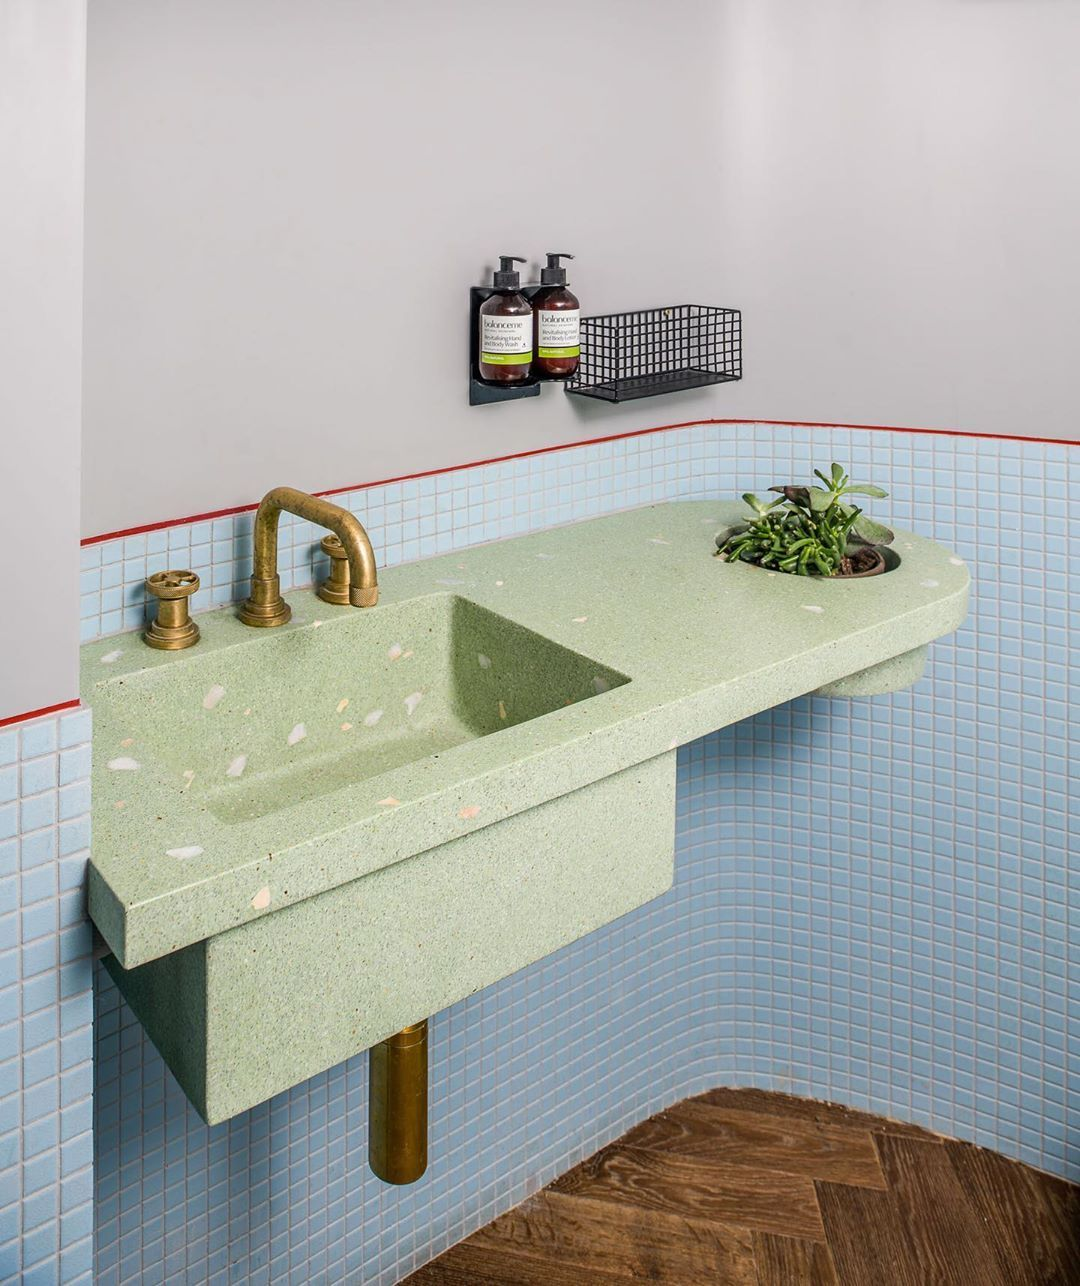 Pin On House Bath Time